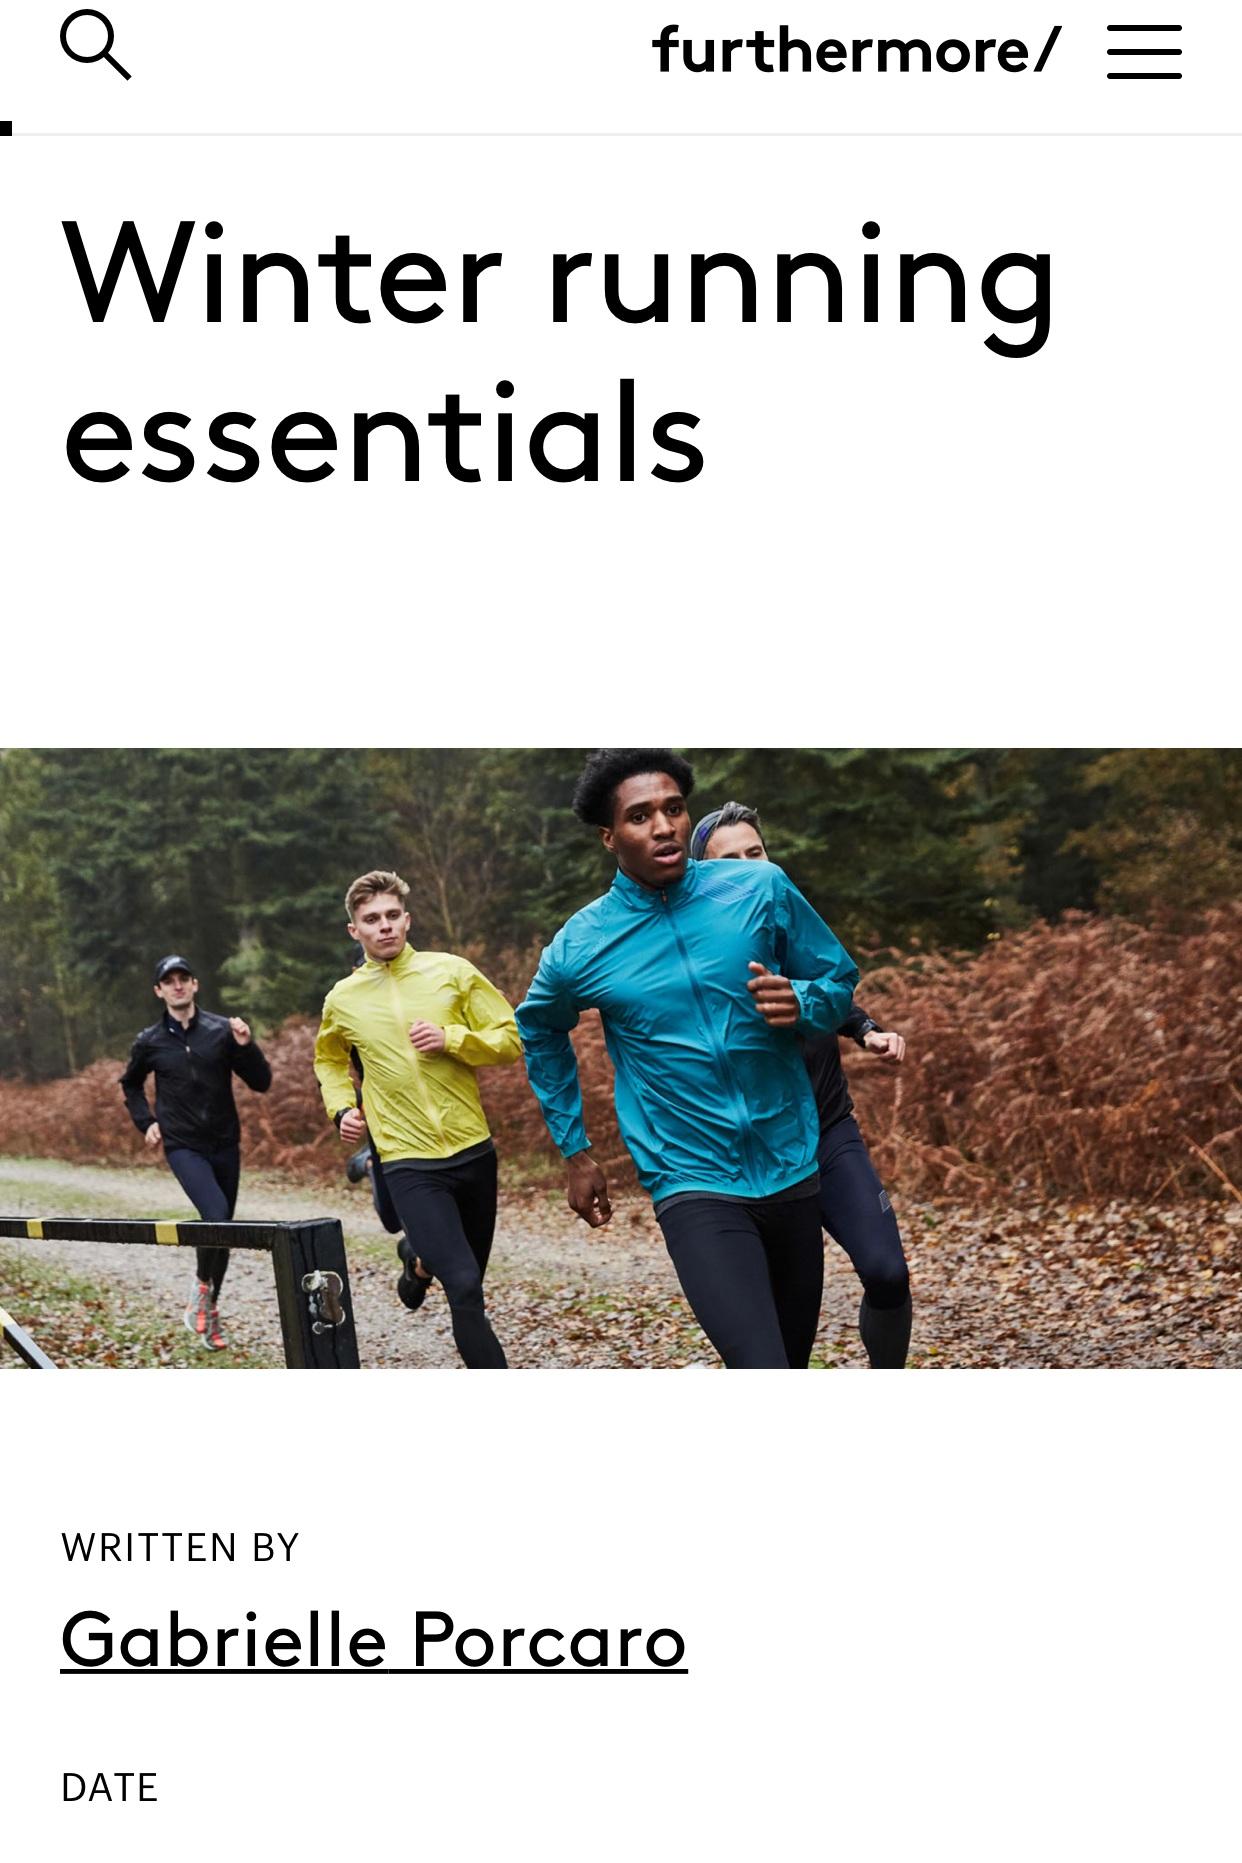 Furthermore: Winter Running Essentials - January 25, 2019